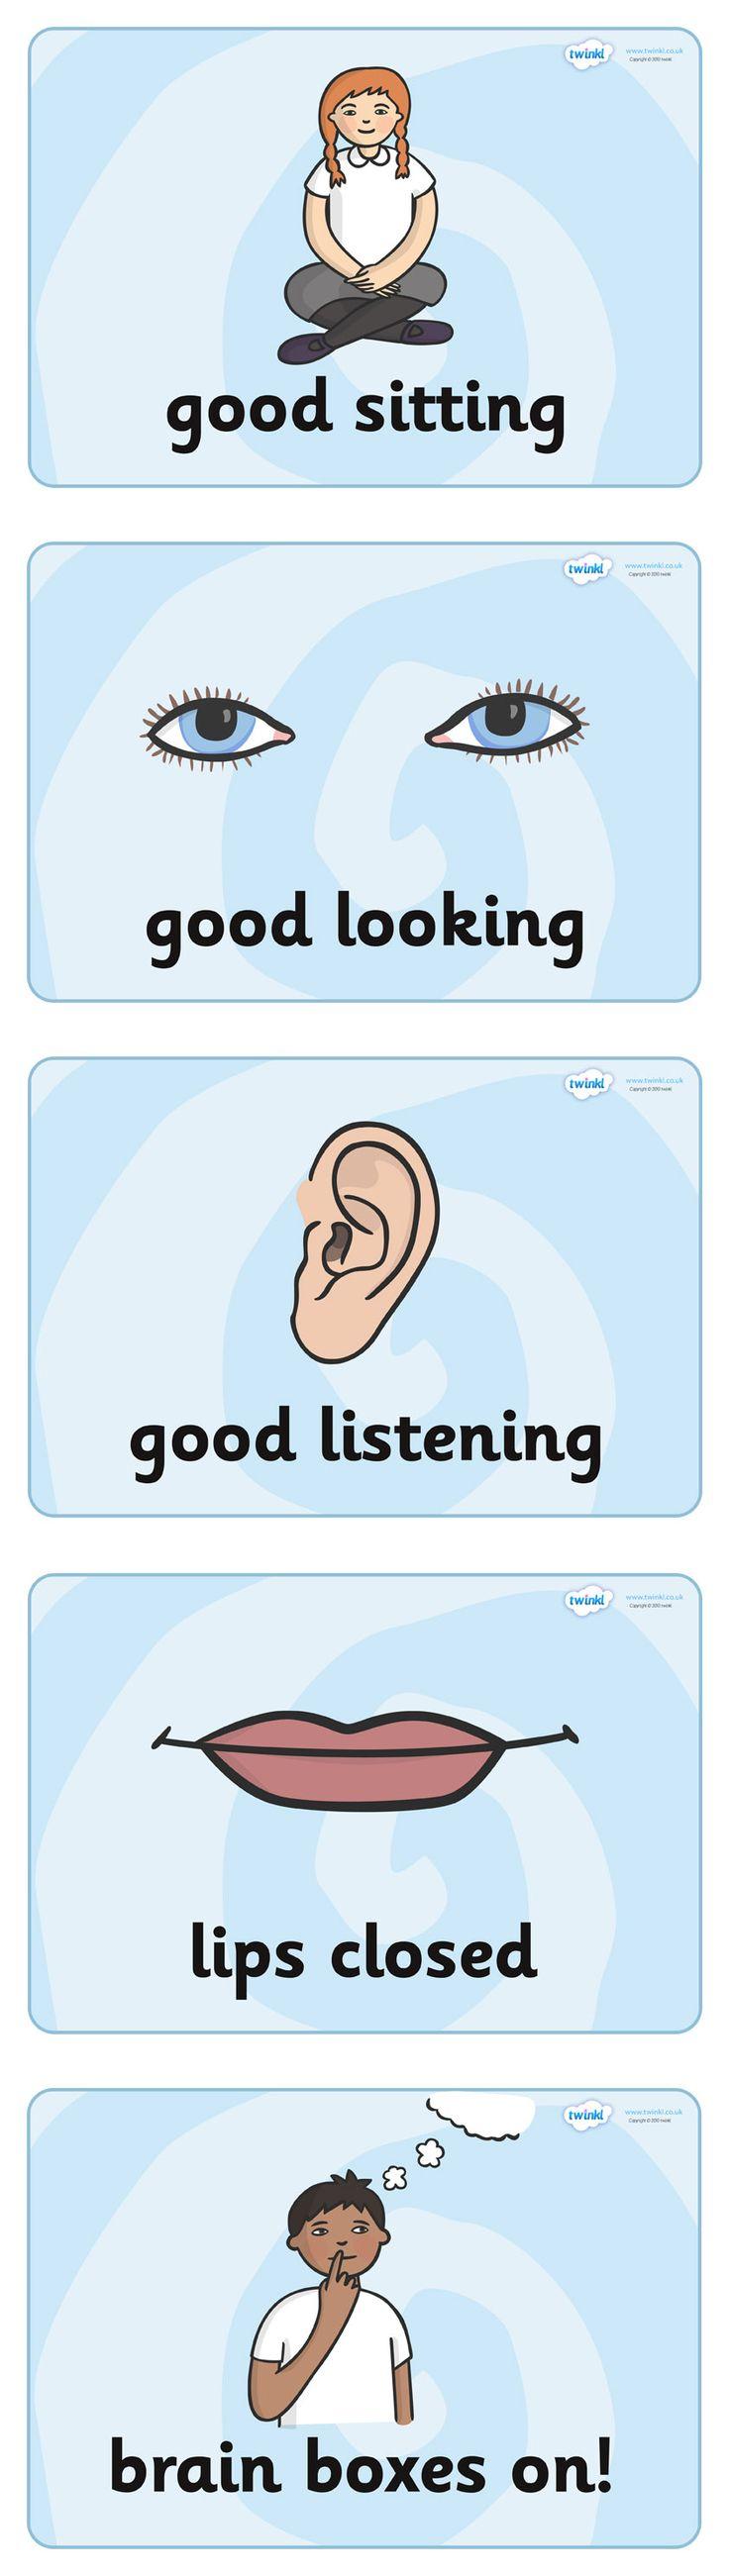 Twinkl Resources >> Good Listening Display Posters  >> Classroom printables for Pre-School, Kindergarten, Primary School and beyond! good listening, listen, behaviour management, SEN, good sitting, good looking, good listening, lips closed, brain box,